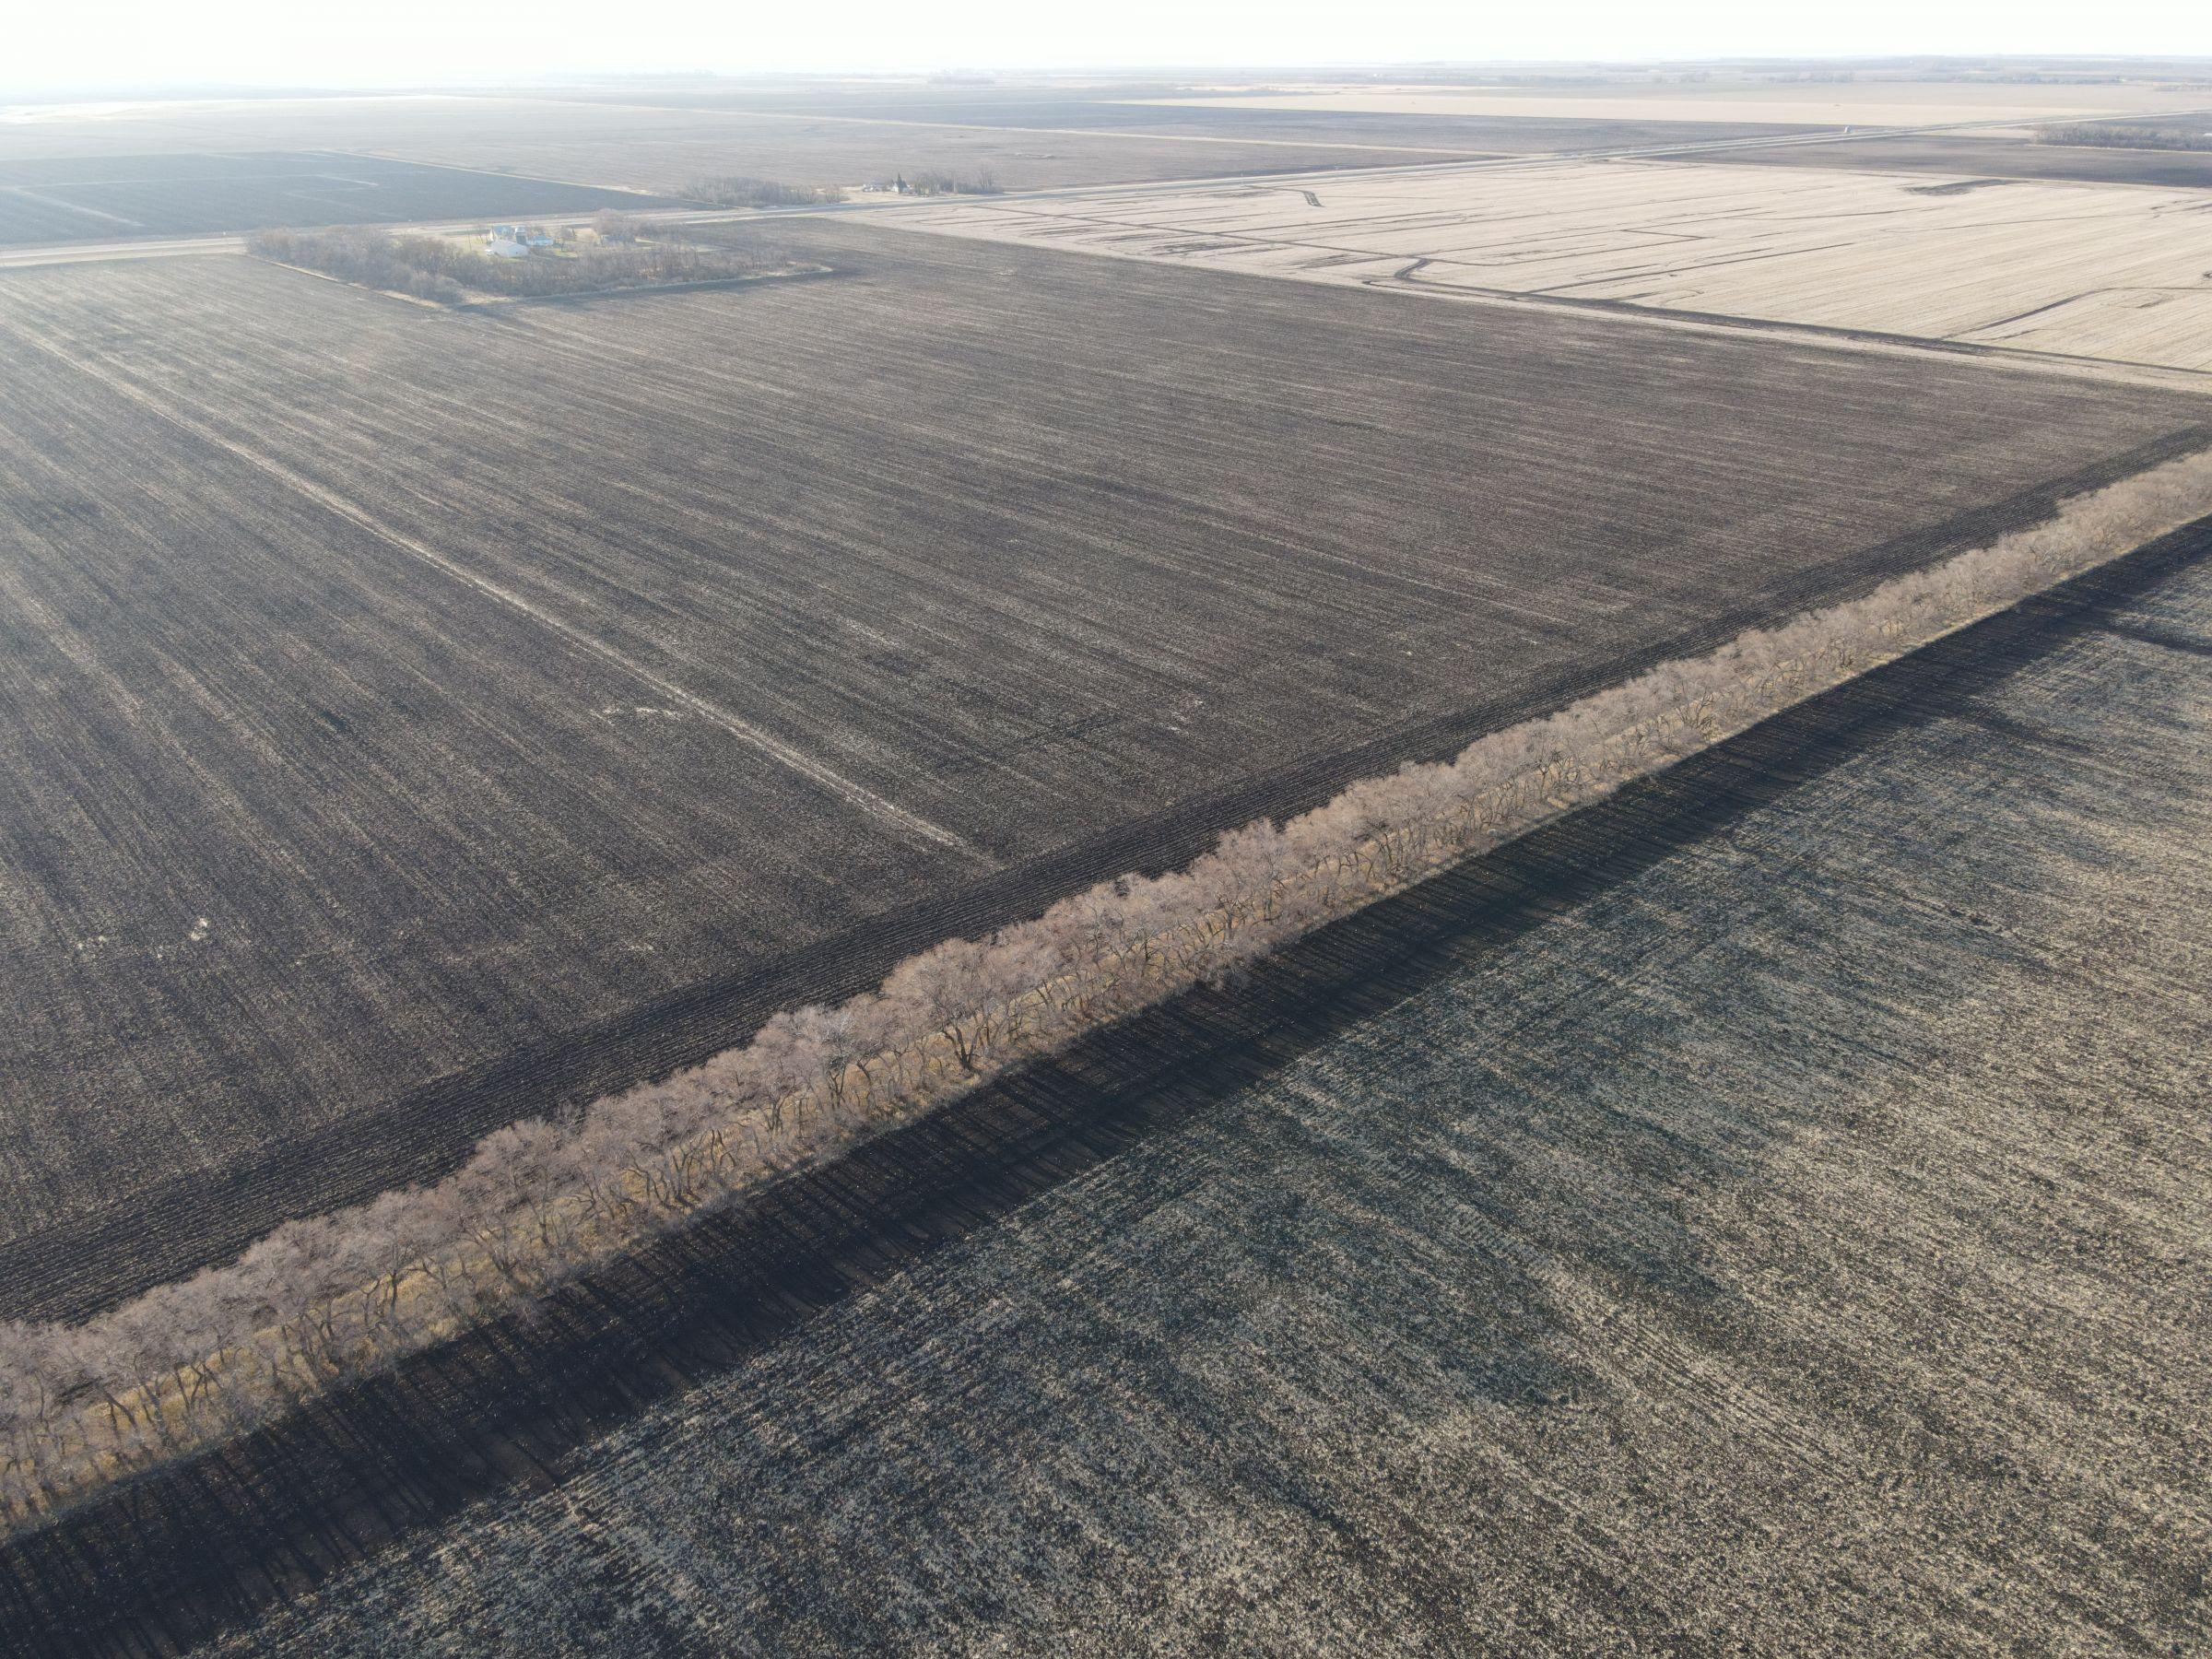 traill-county-north-dakota-74-acres-listing-number-15607-1-2021-06-22-201952.JPG